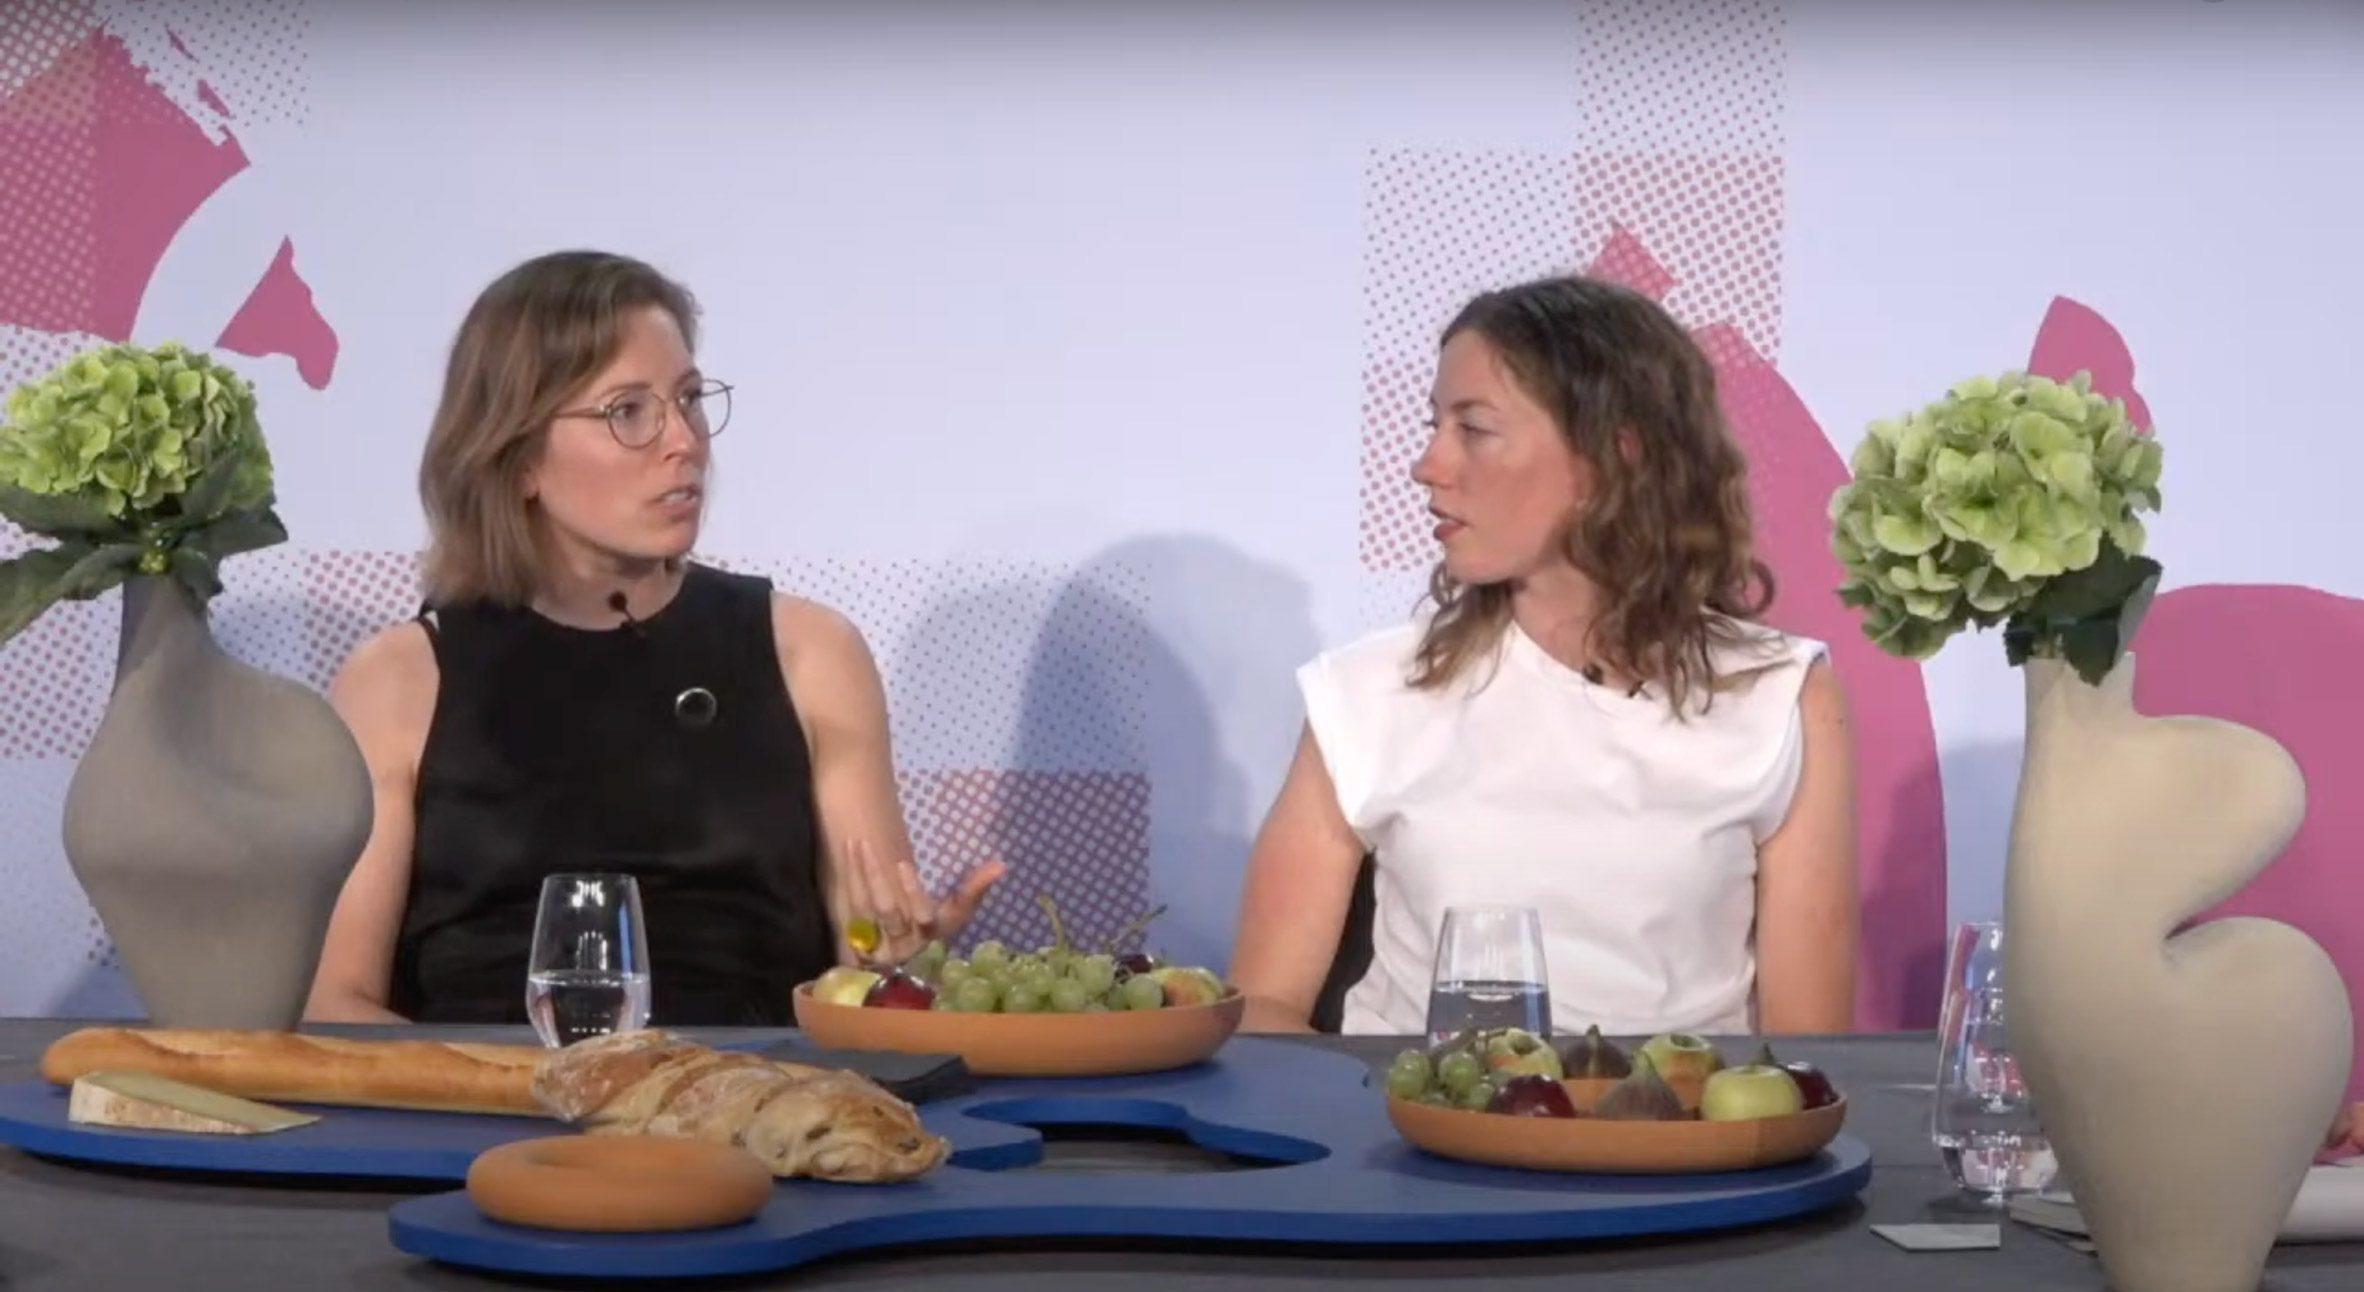 Марьян ван Обель и Полин ван Донген на Design Miami / Basel talk